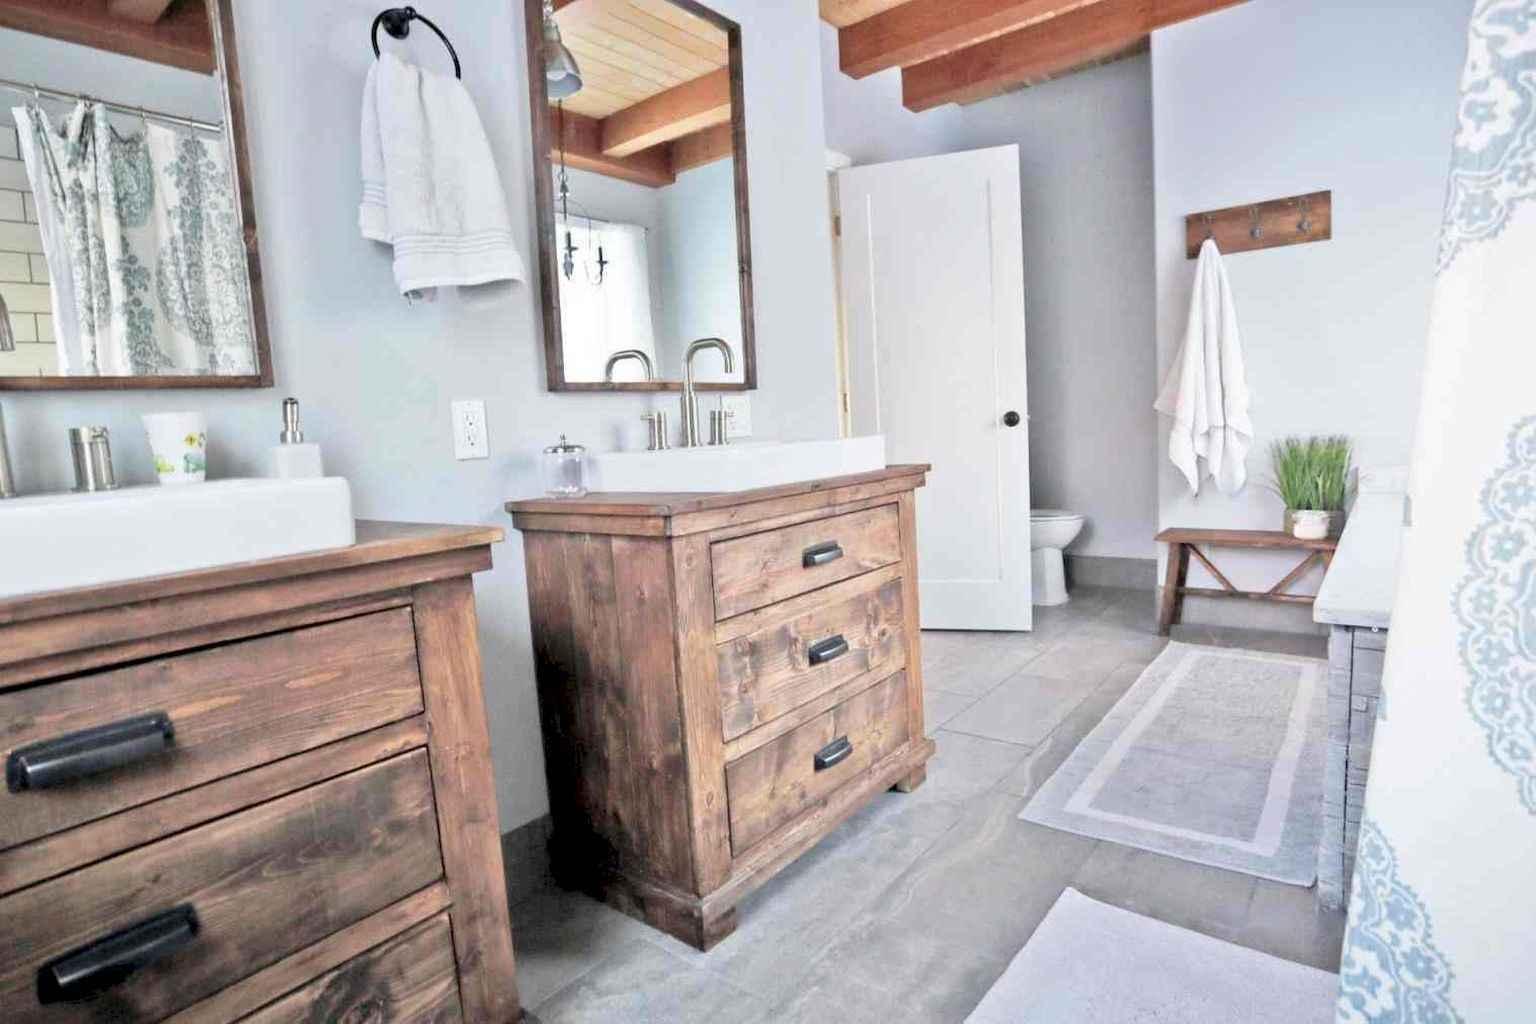 80 Awesome Farmhouse Master Bathroom Decor Ideas And Remodel (56)